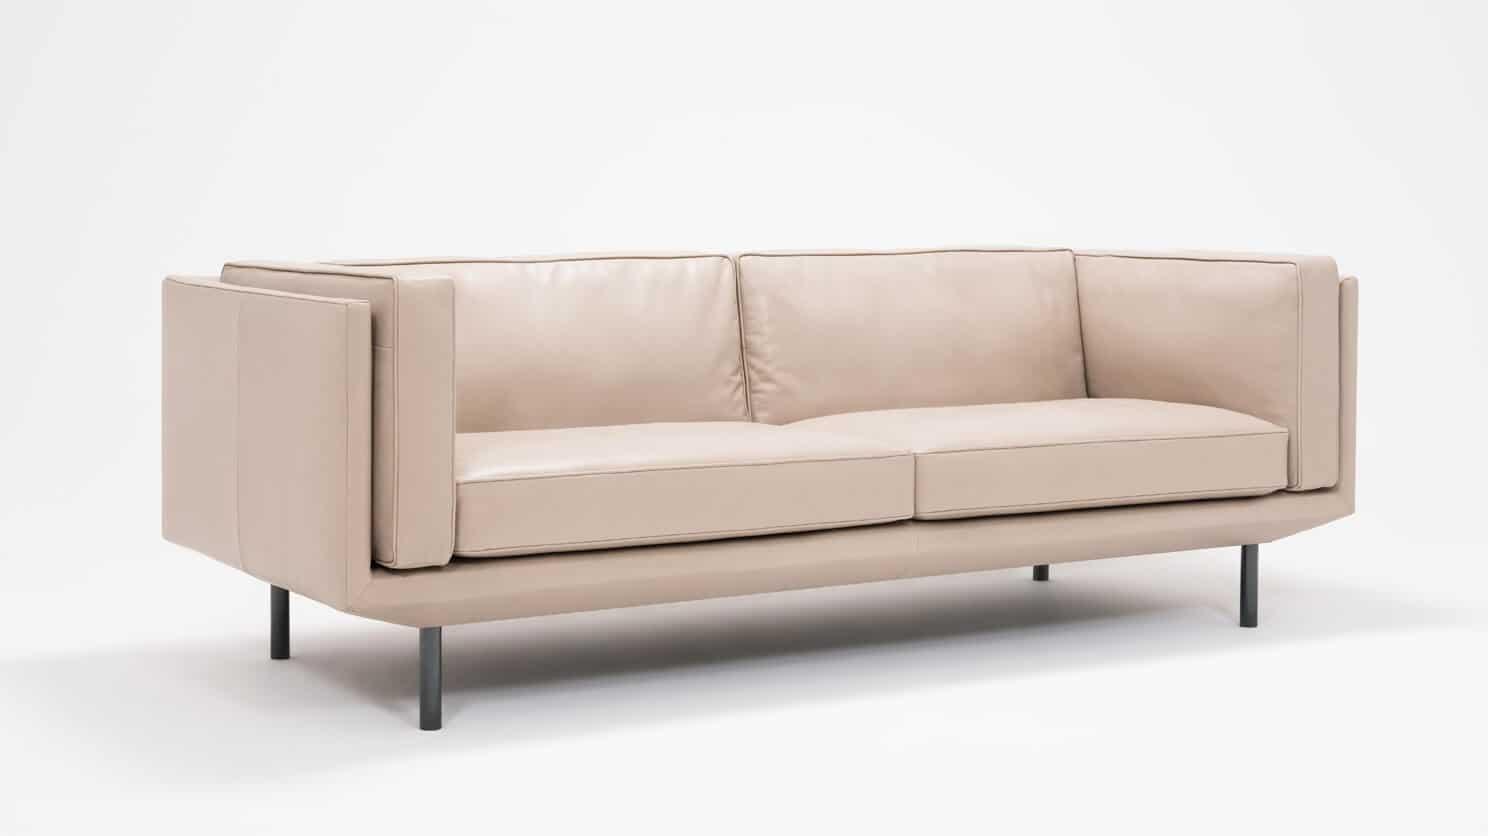 37154 01 02 sofa plateau 84 feather coachella warm grey front angled view